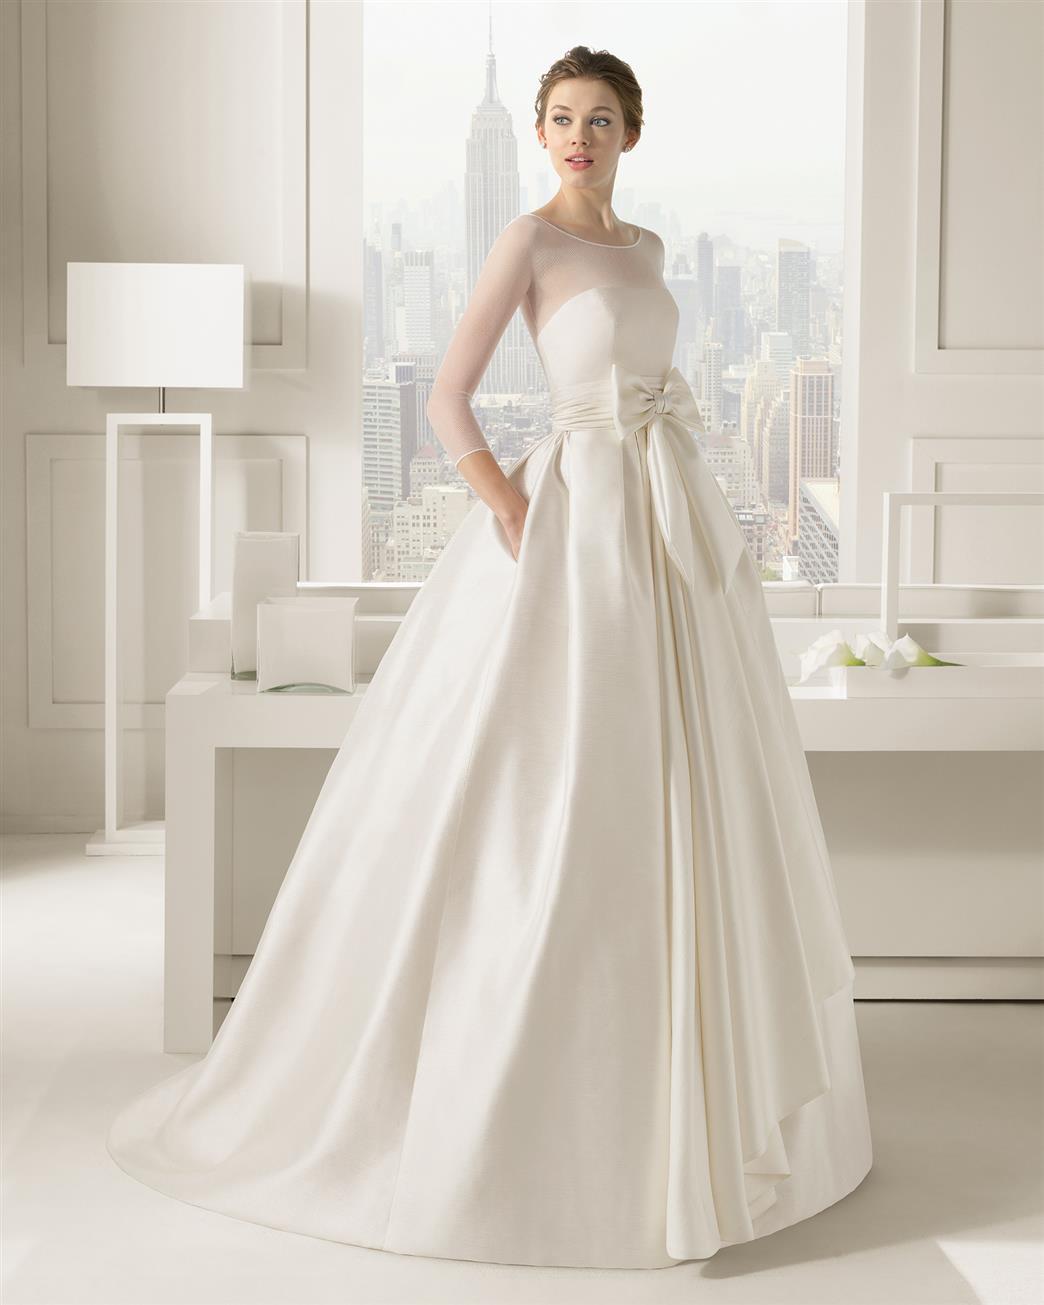 long sleeve wedding dresses wedding gowns Long Sleeve Wedding Dress from Rosa Clara Collection Segovia